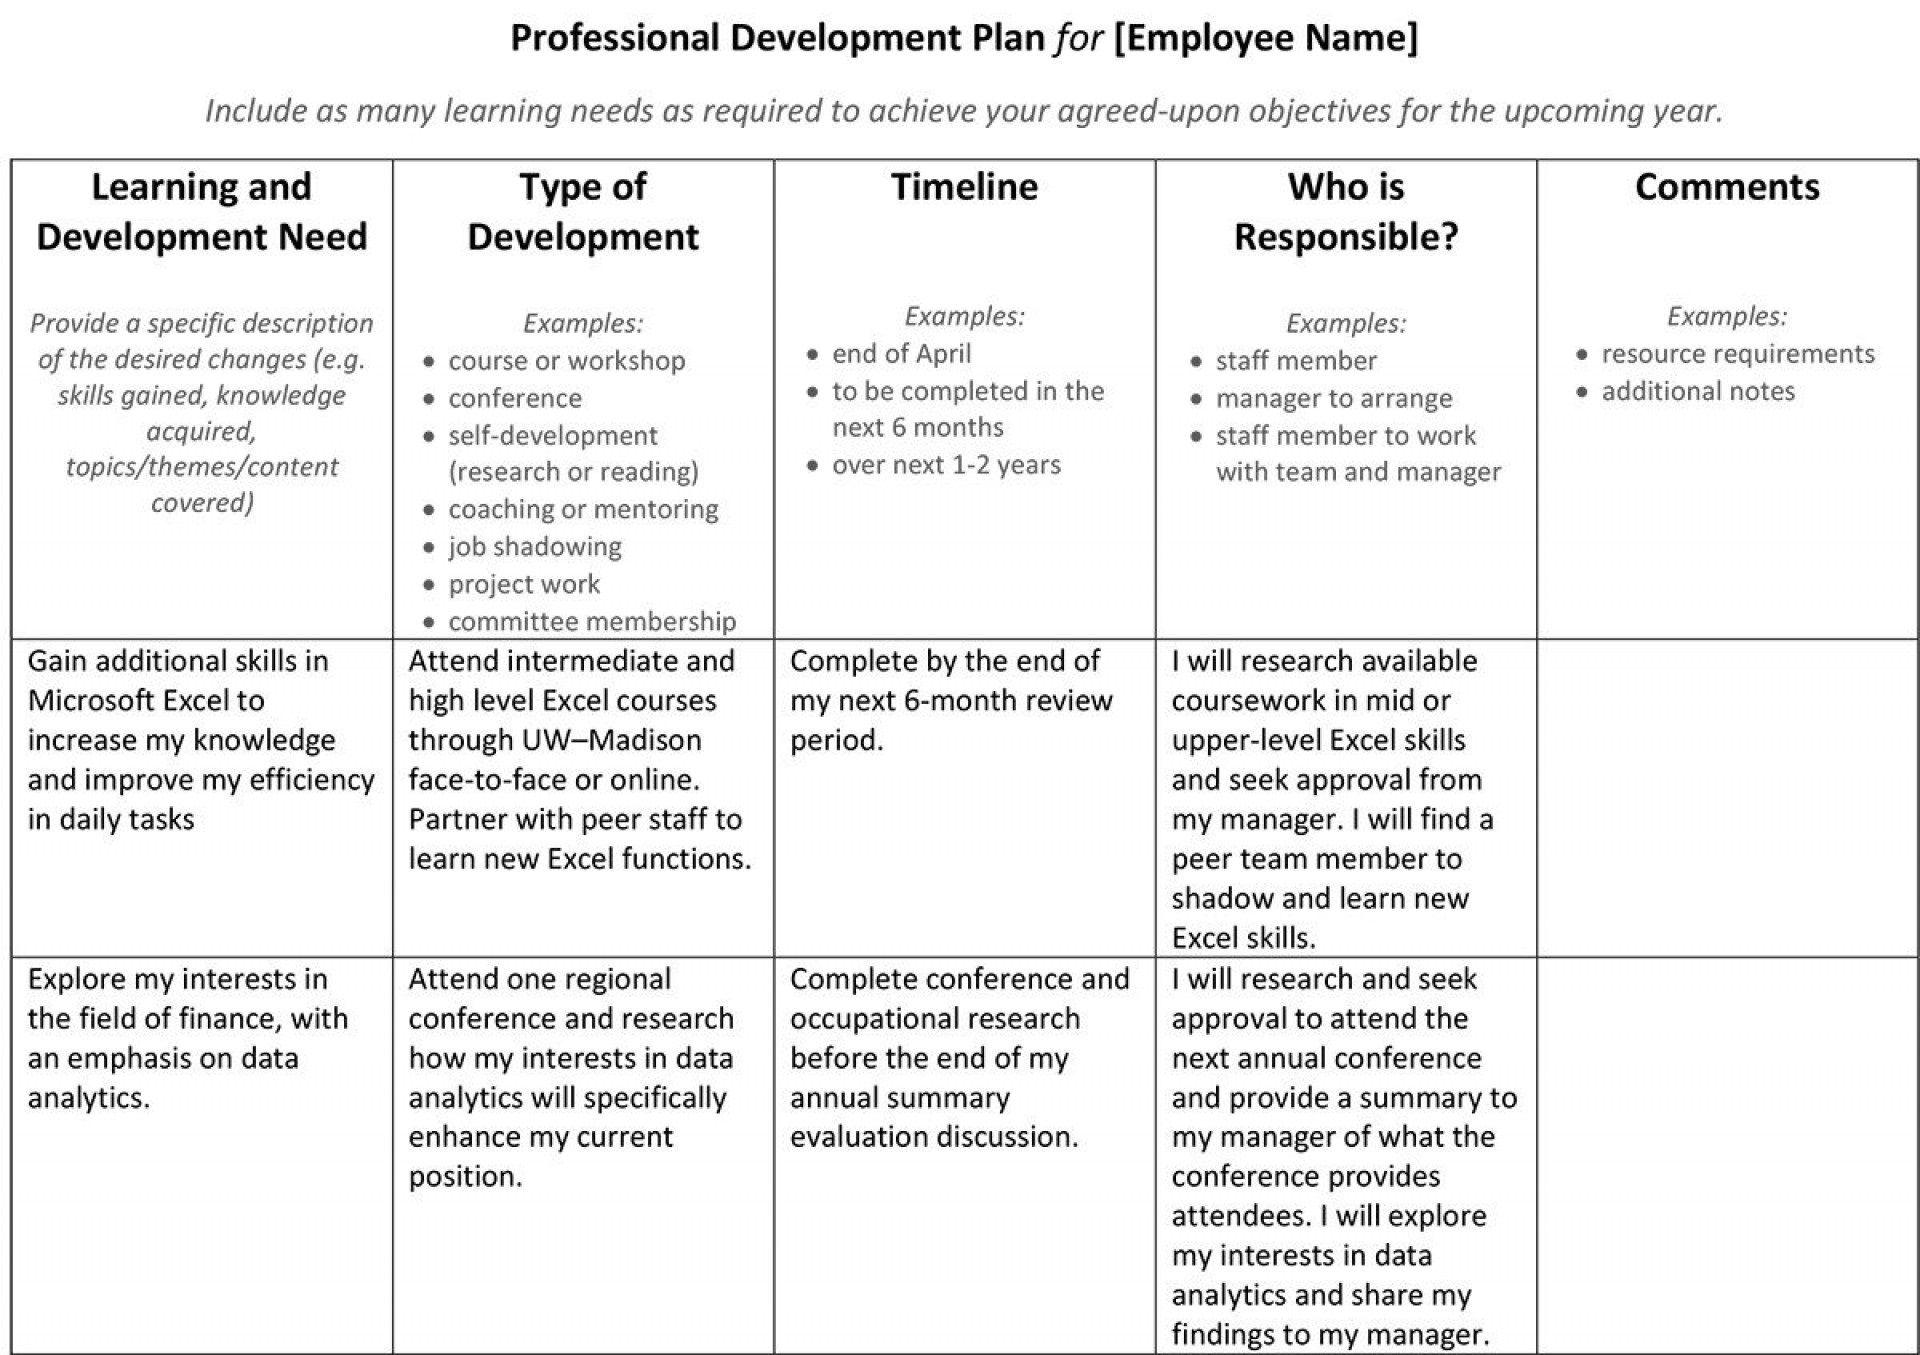 004 Fantastic Professional Development Plan Template For School Highest Clarity  Schools Example Teaching AssistantFull